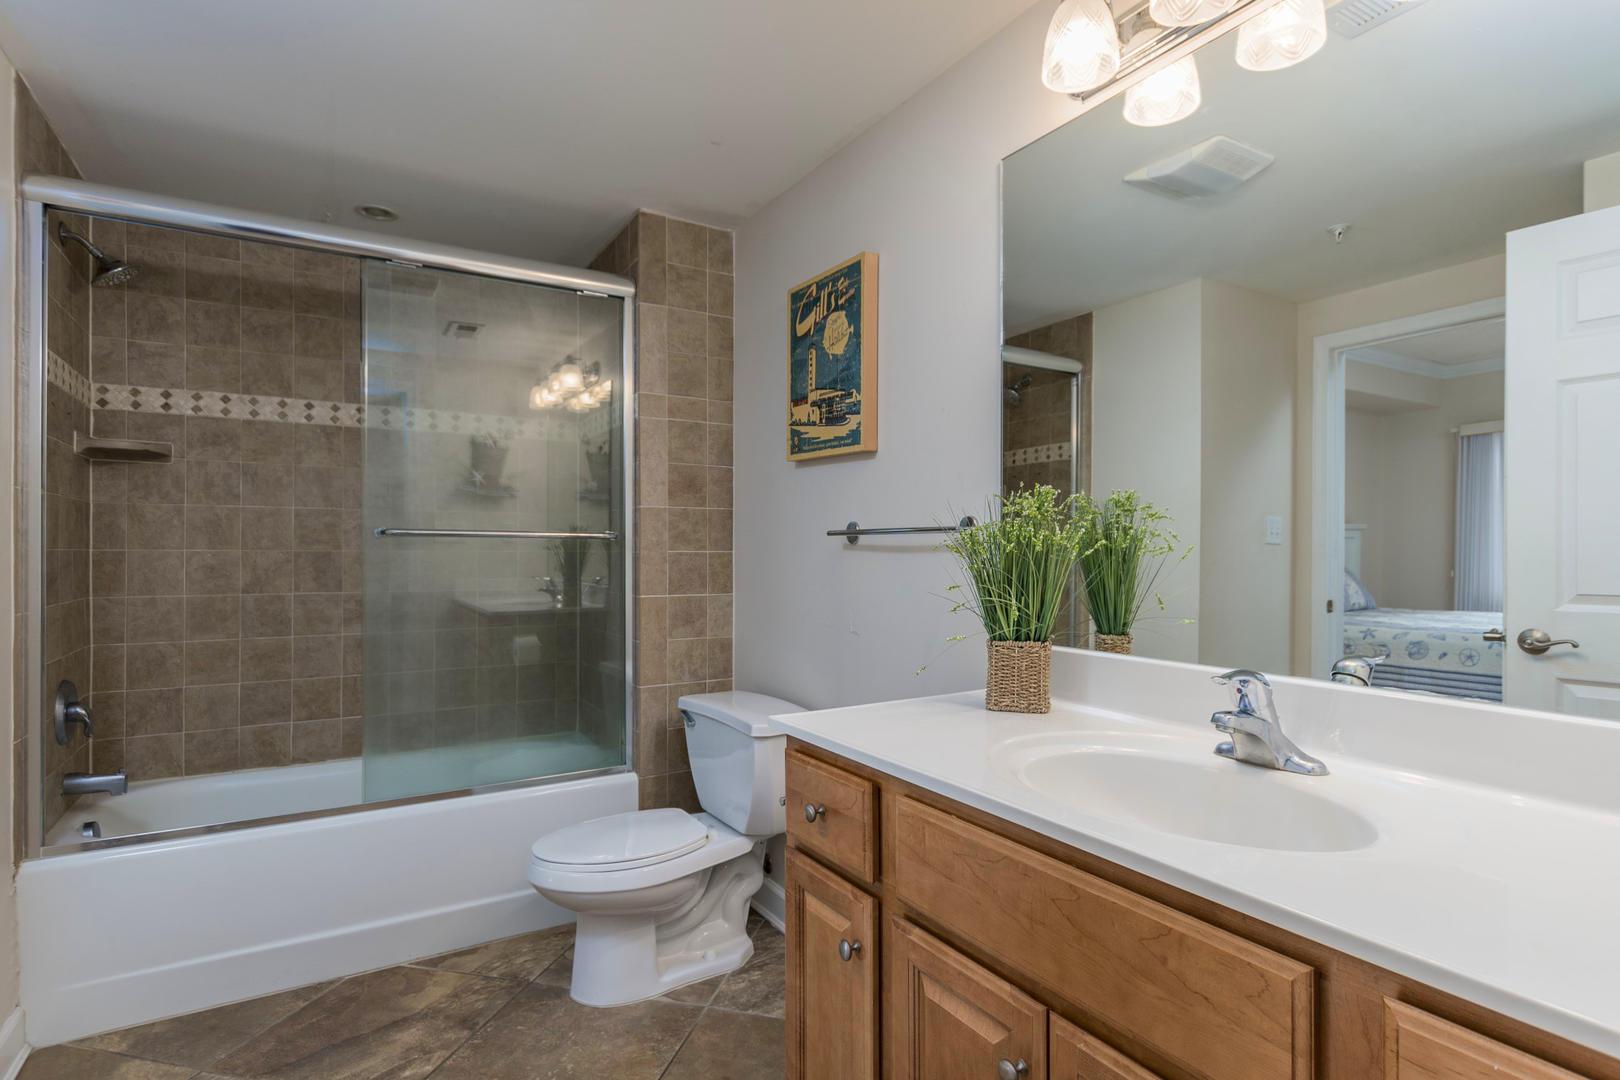 Oceans Mist 301 - Bathroom 3